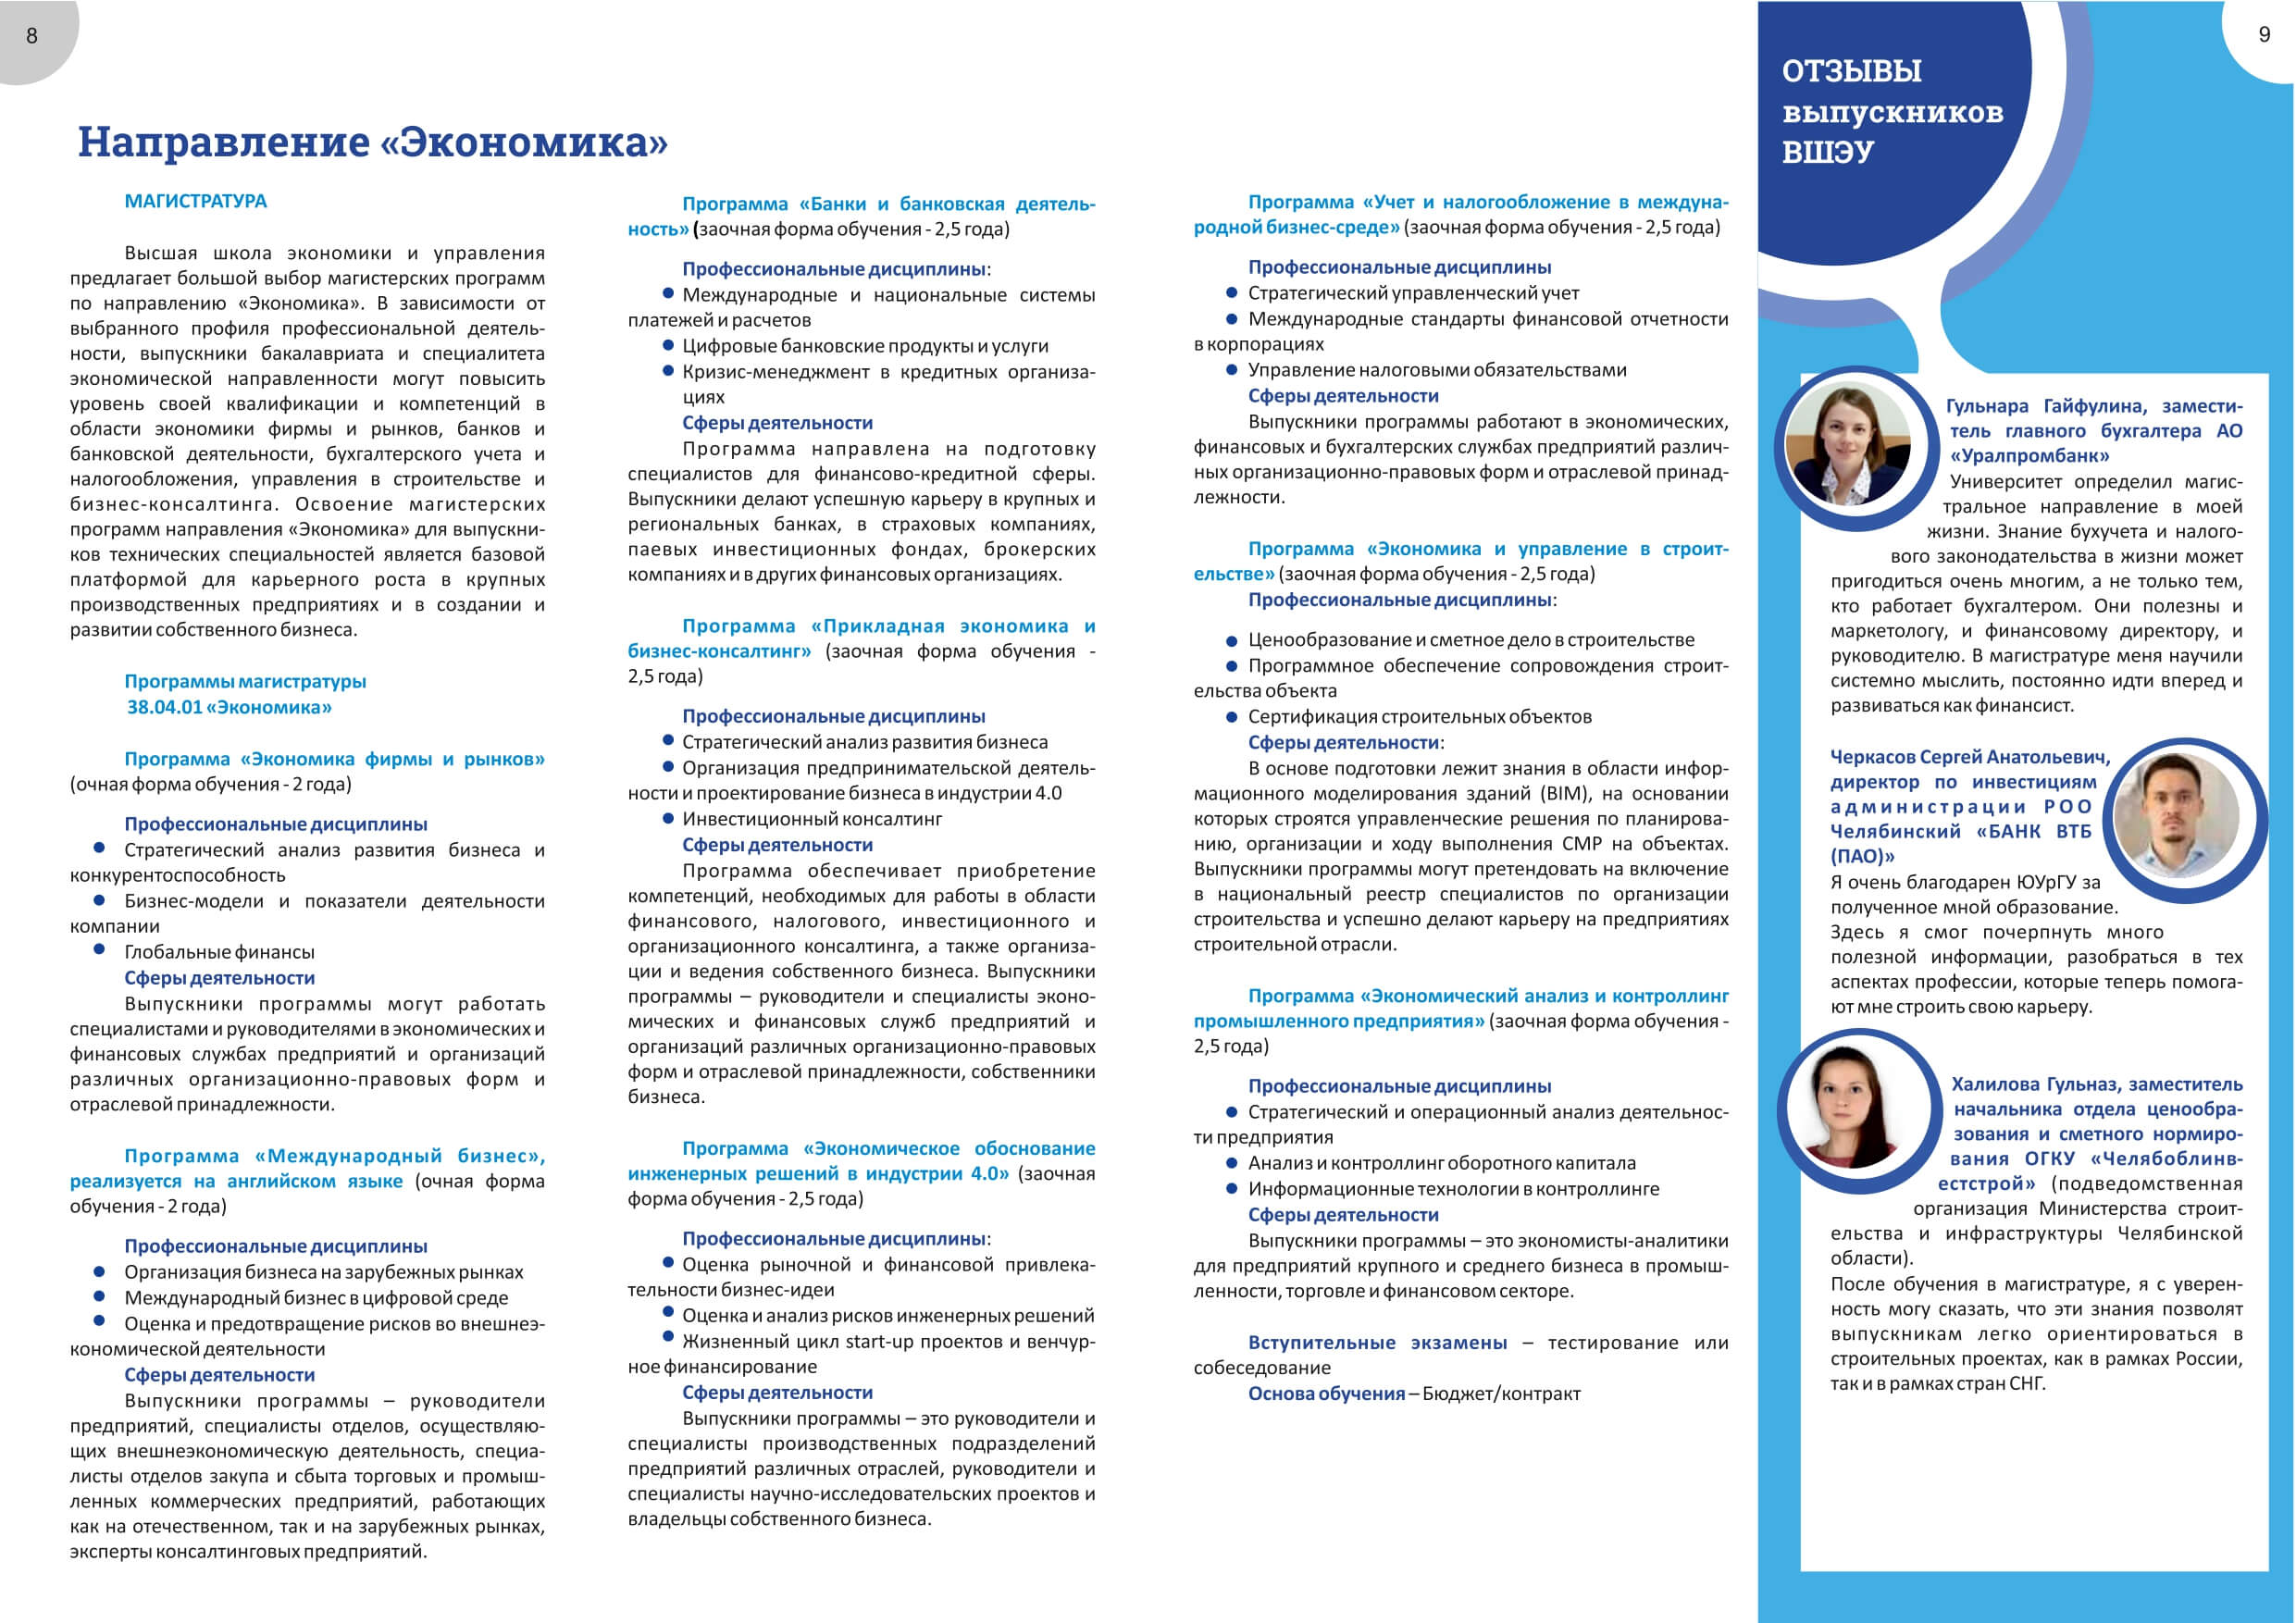 ВШЭУ Прием абитуриентов 2021_pages-to-jpg-0005